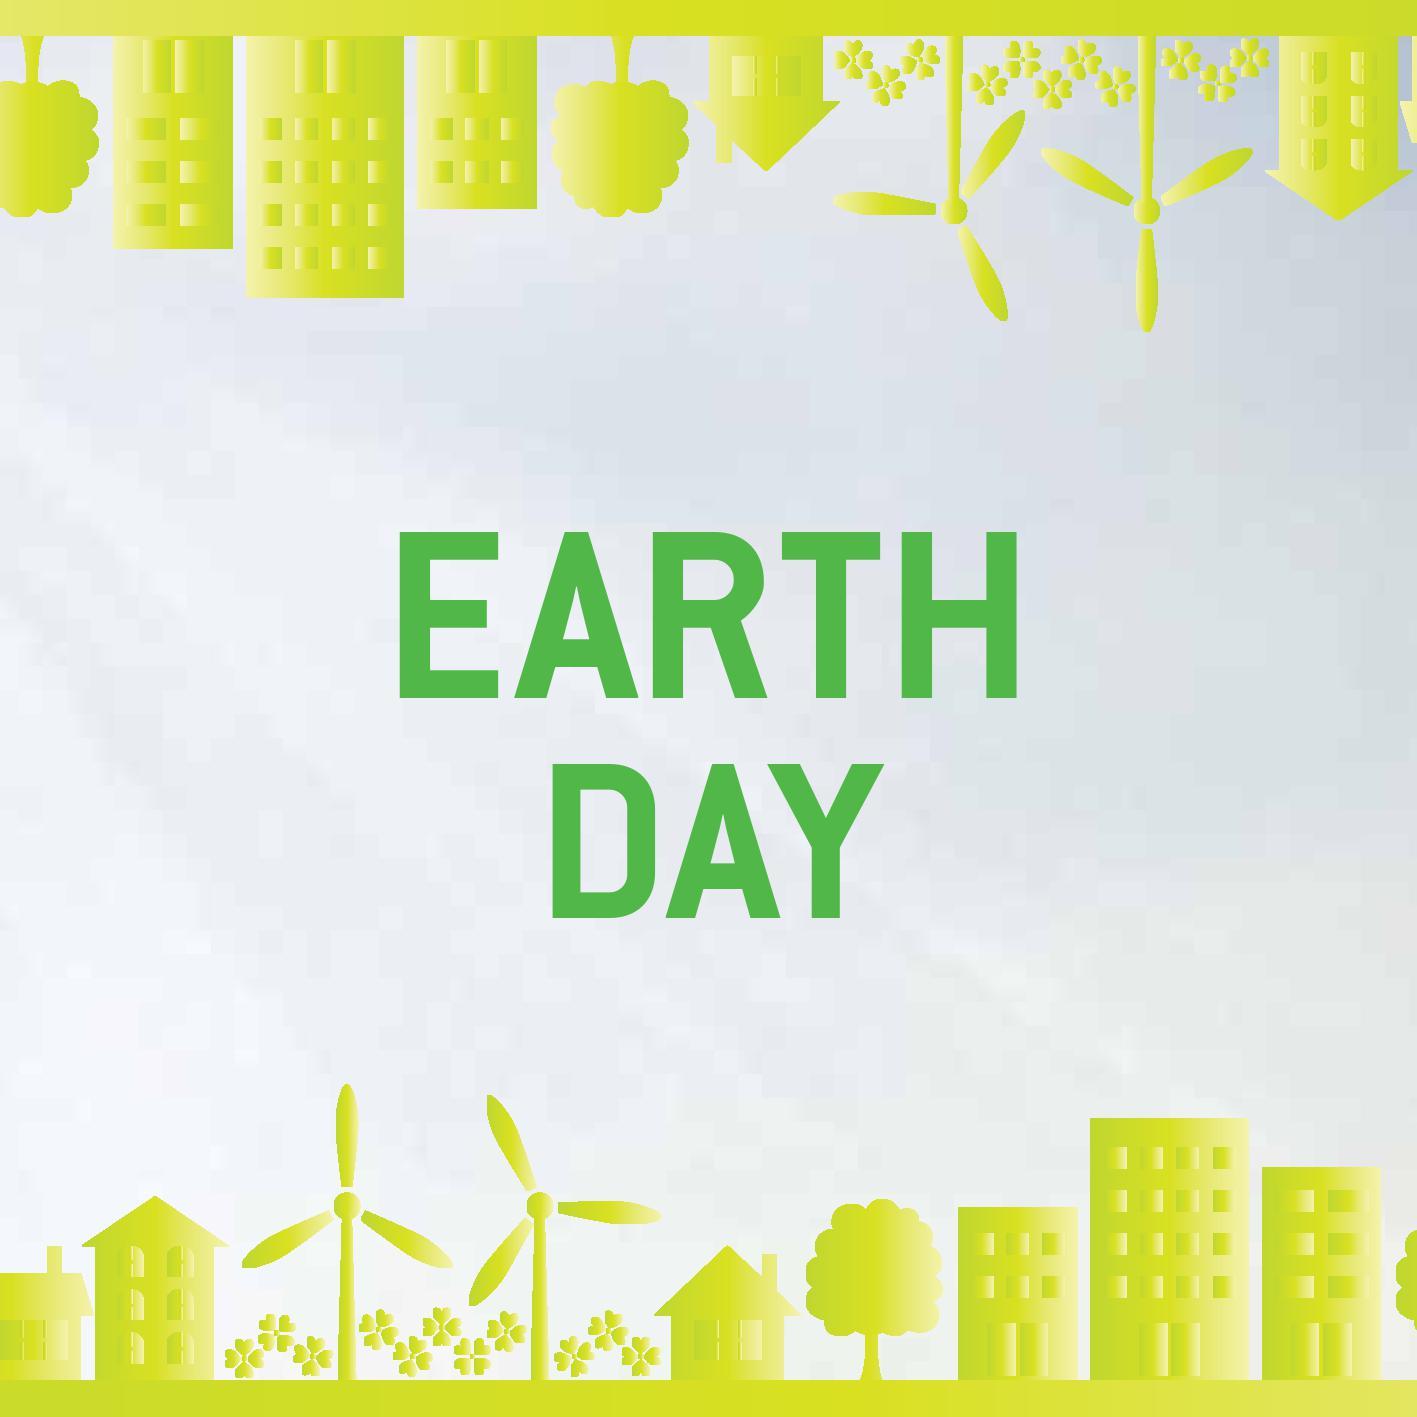 Earth Day Rendez-Vous 2016 - April 22, 2016